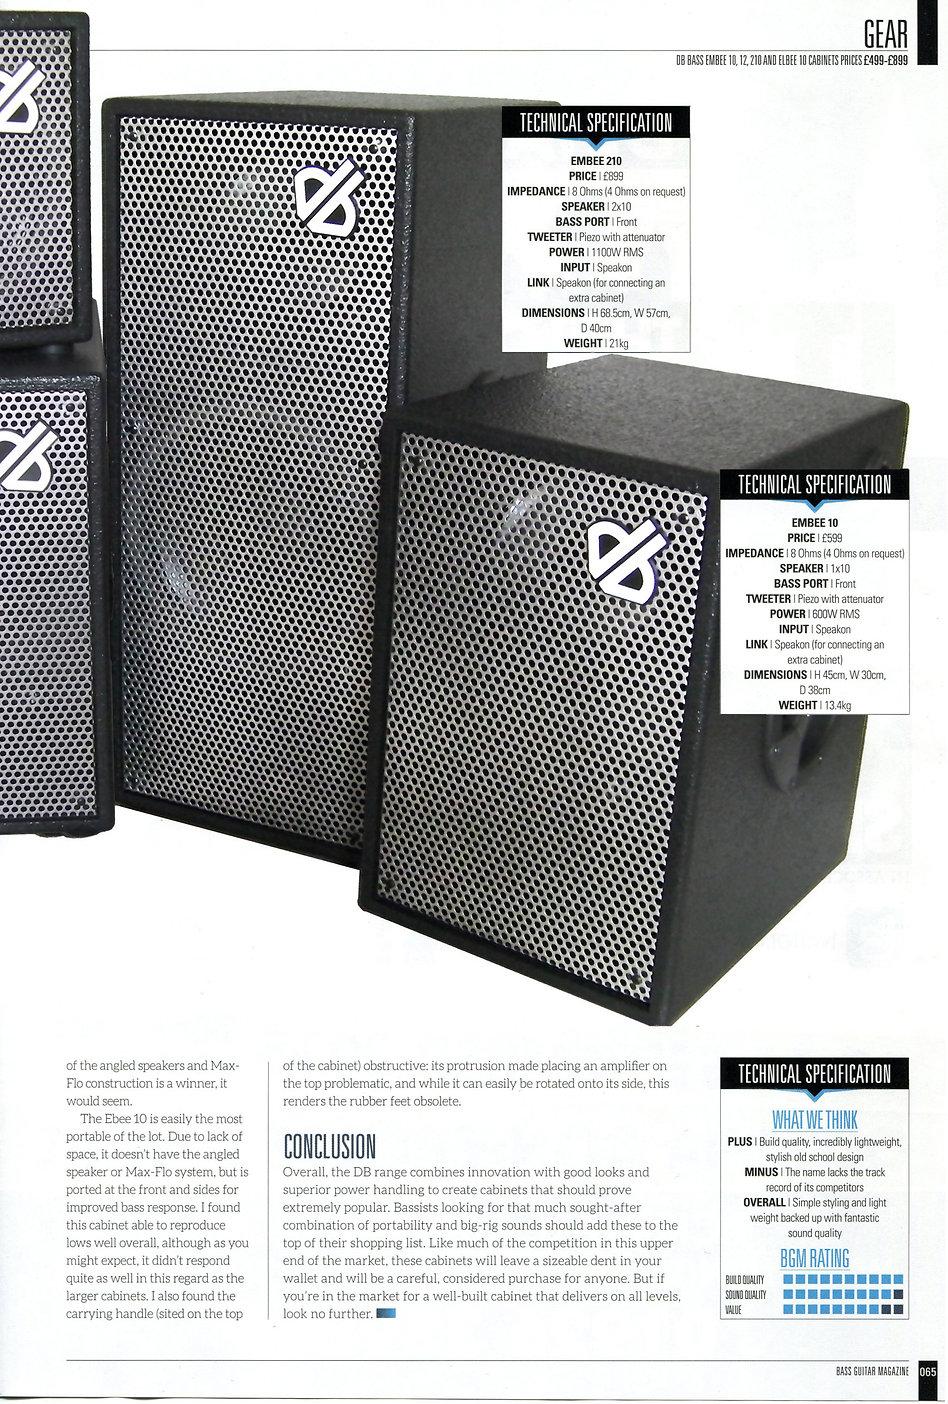 DB Bass BGM review 2 April 2015.jpg